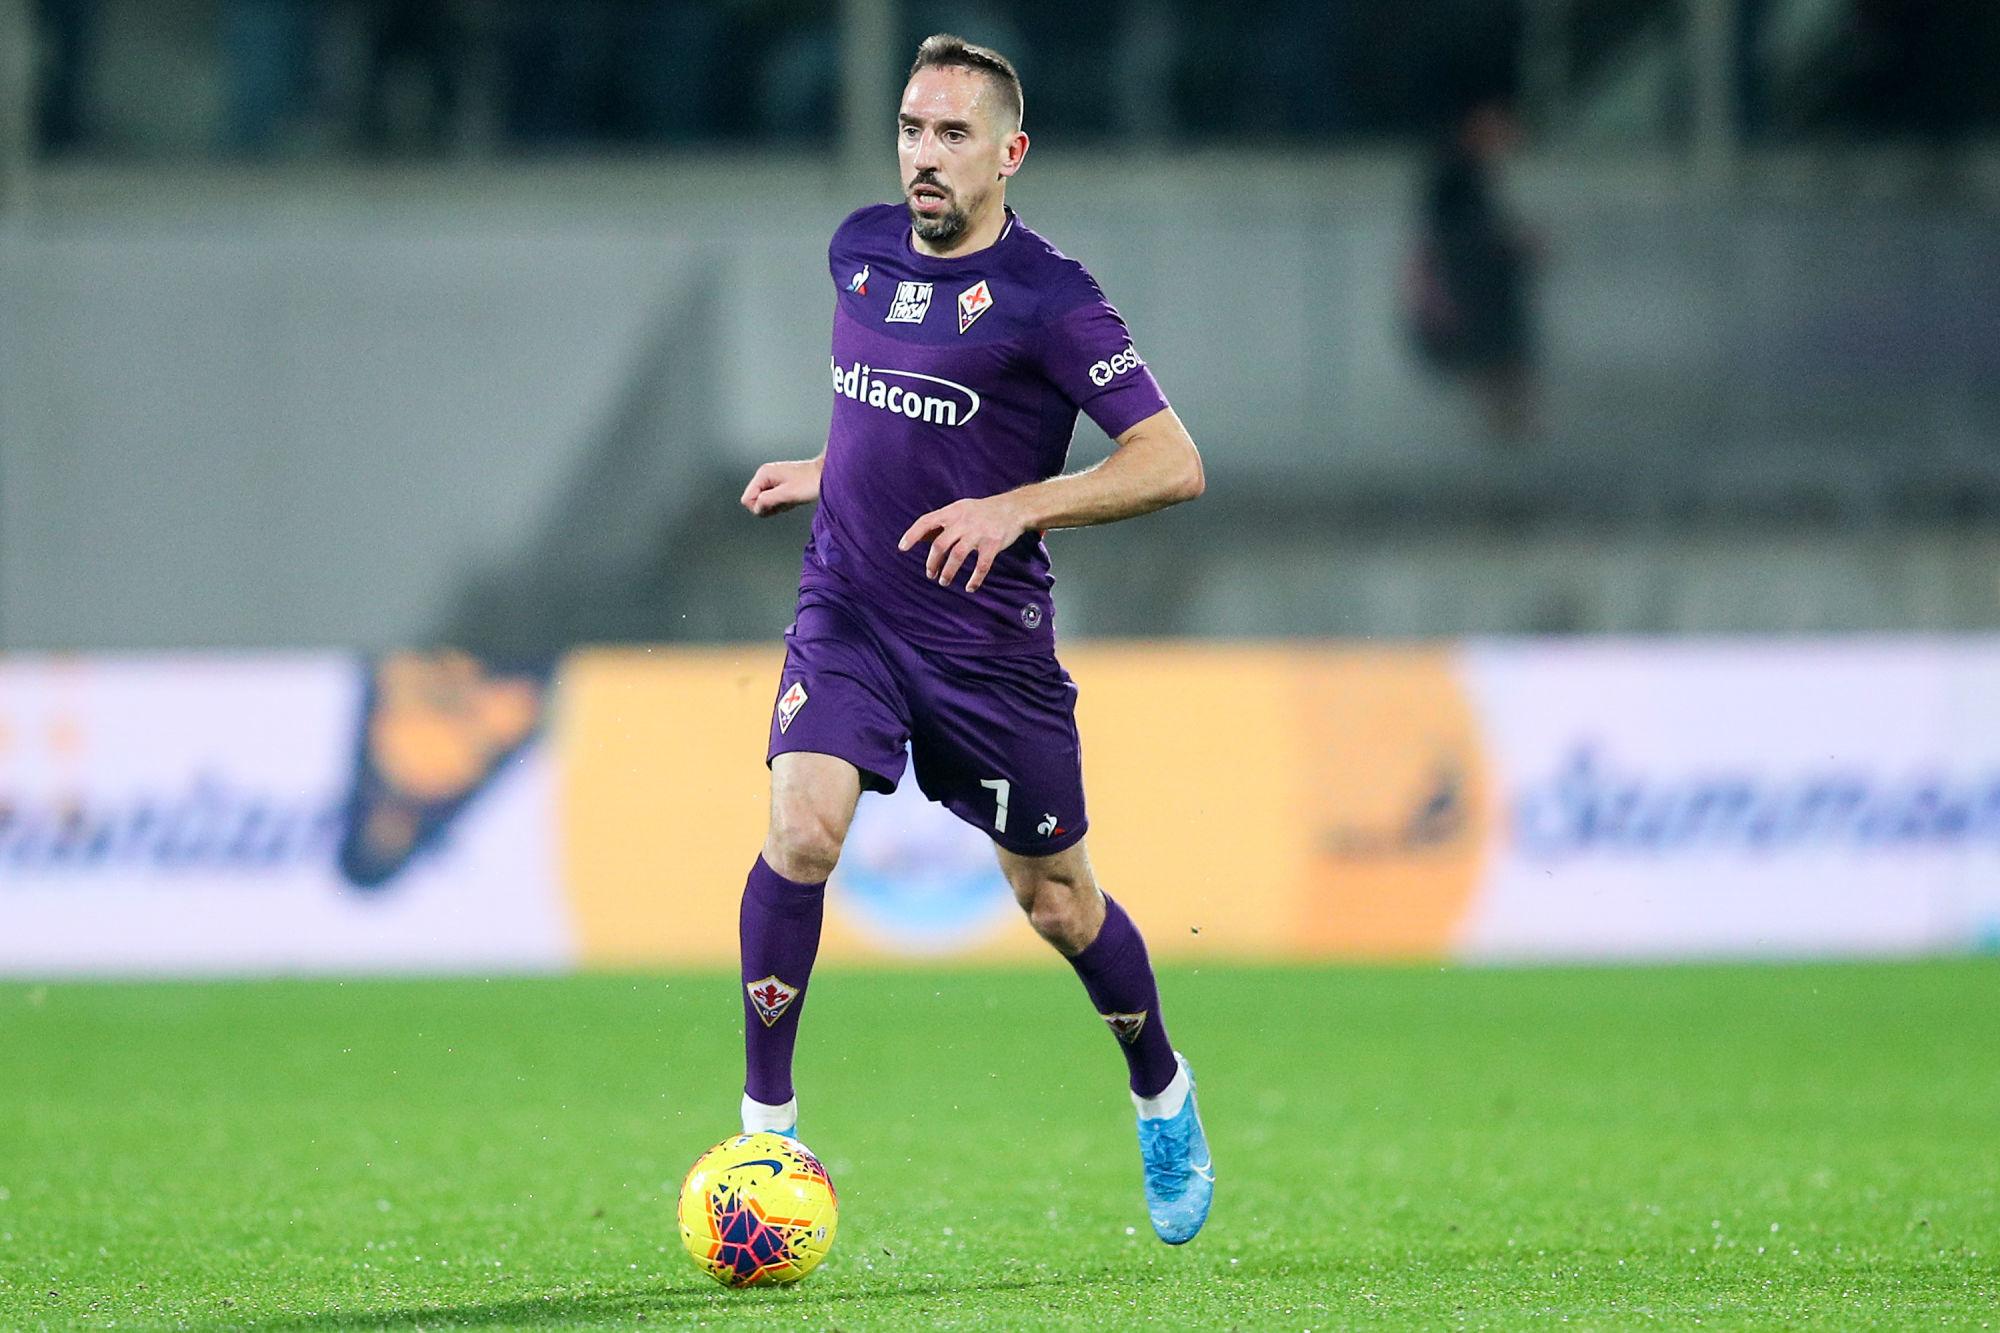 Ex-OM : Franck Ribéry cambriolé, il va prendre les décisions nécessaires